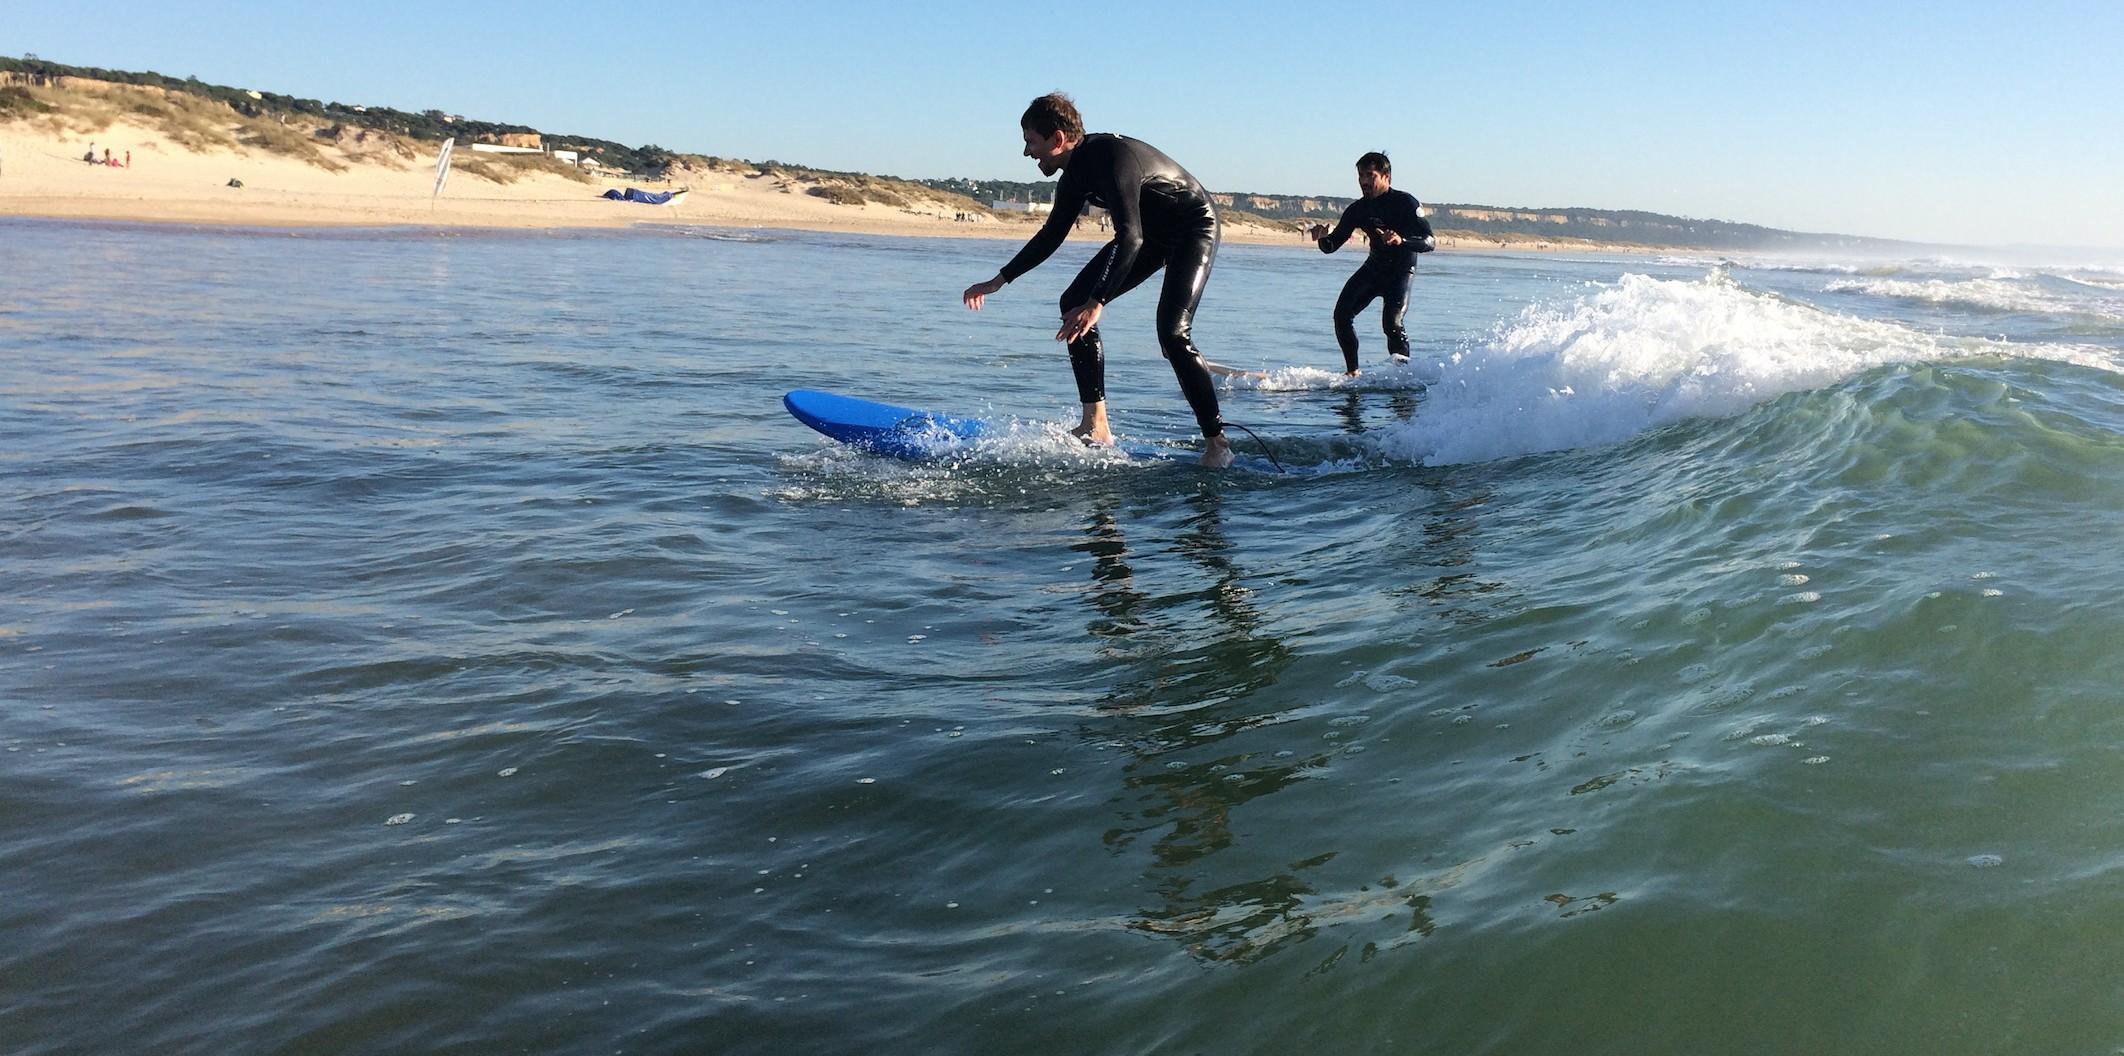 Home Epicsurfschool - 16 epic surfing photos